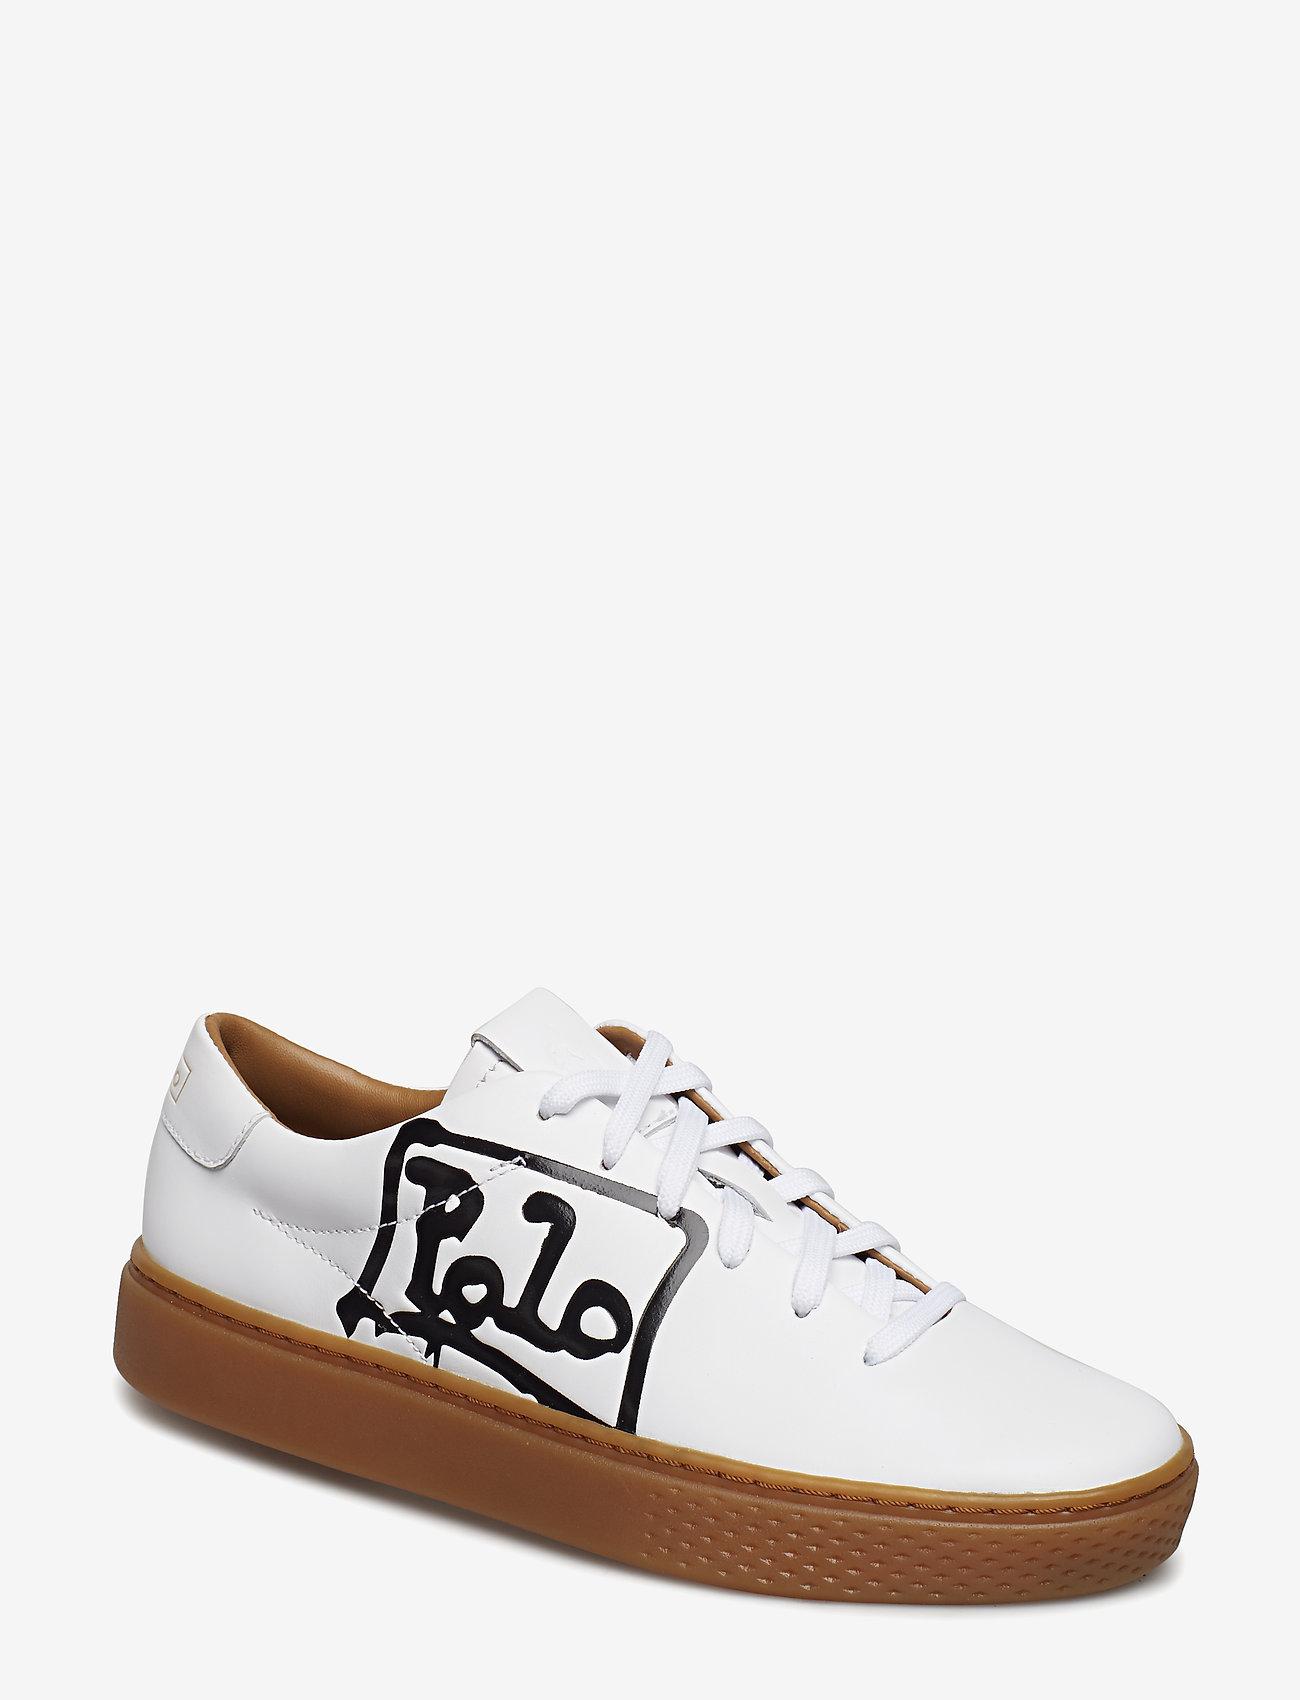 Court 125 Leather Sneaker (White/black